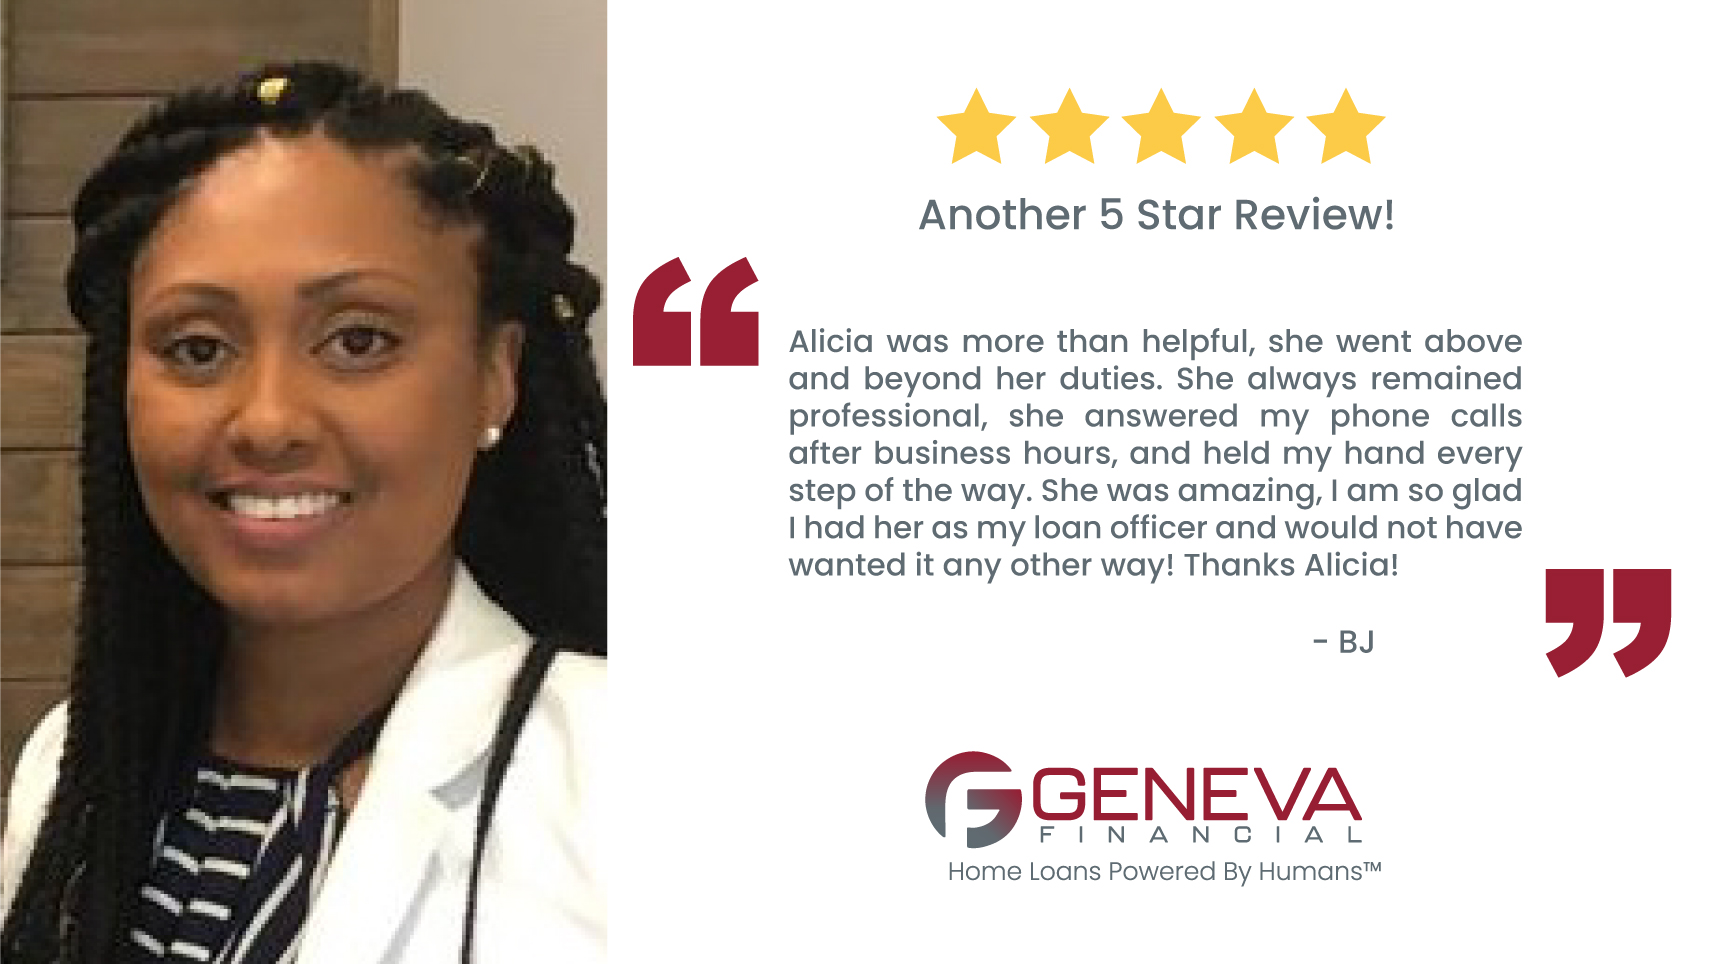 Alicia Bradford, Loan Originator serving the state of Georgia